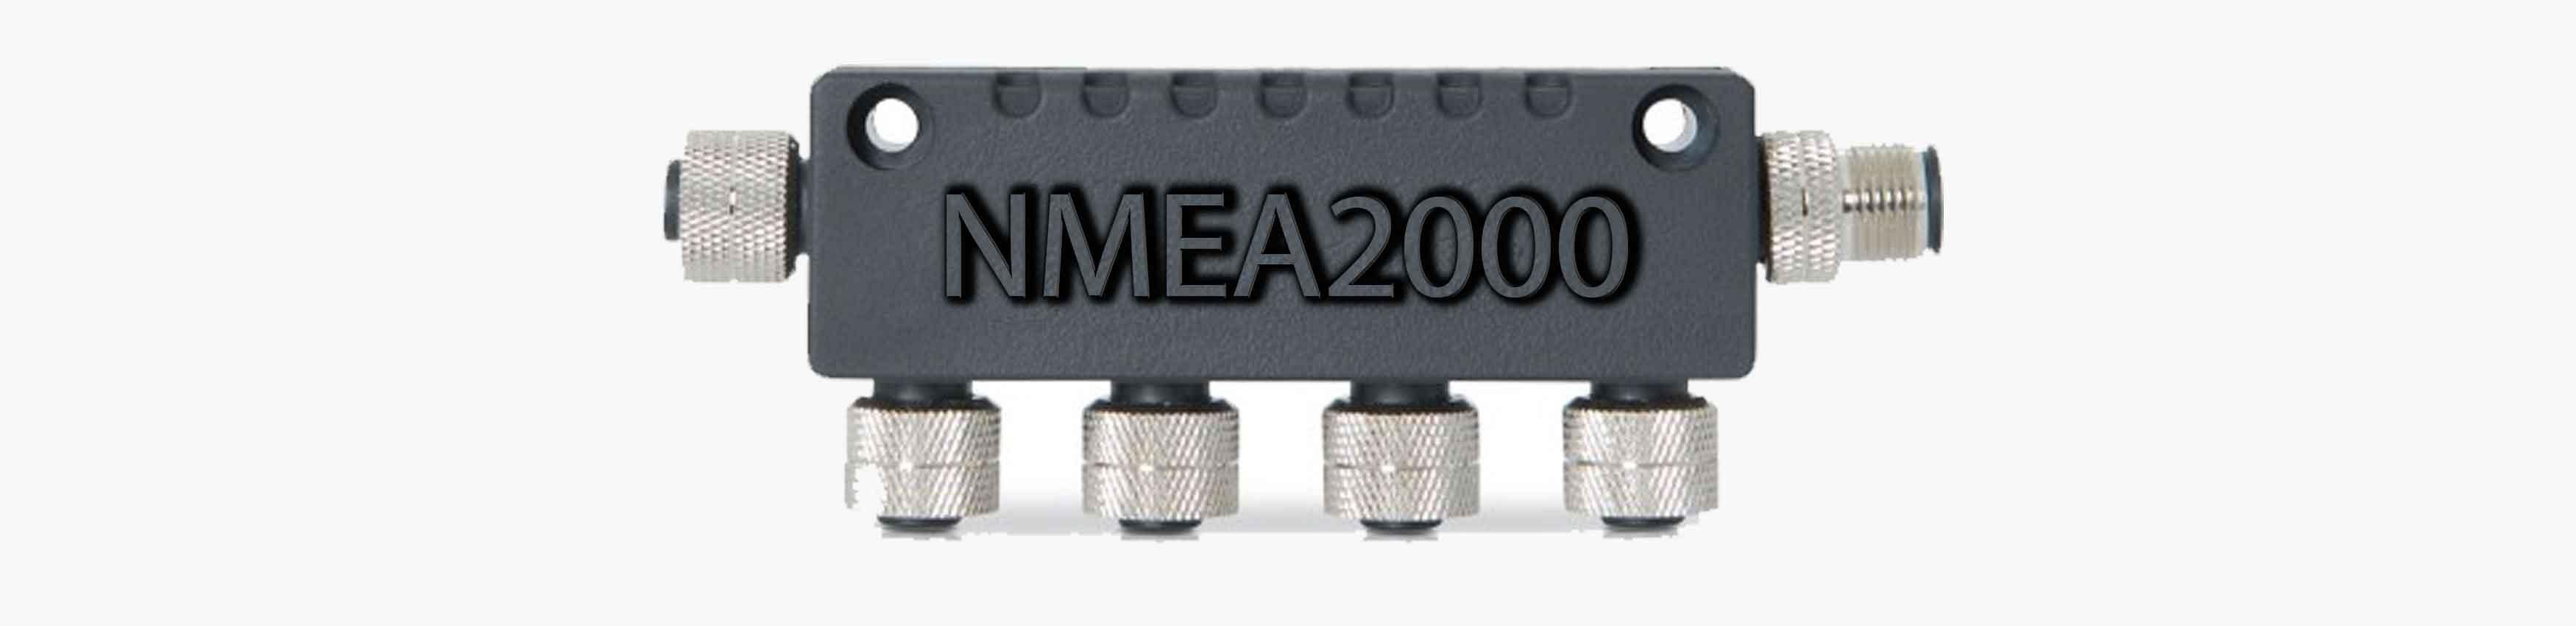 Nmea2000